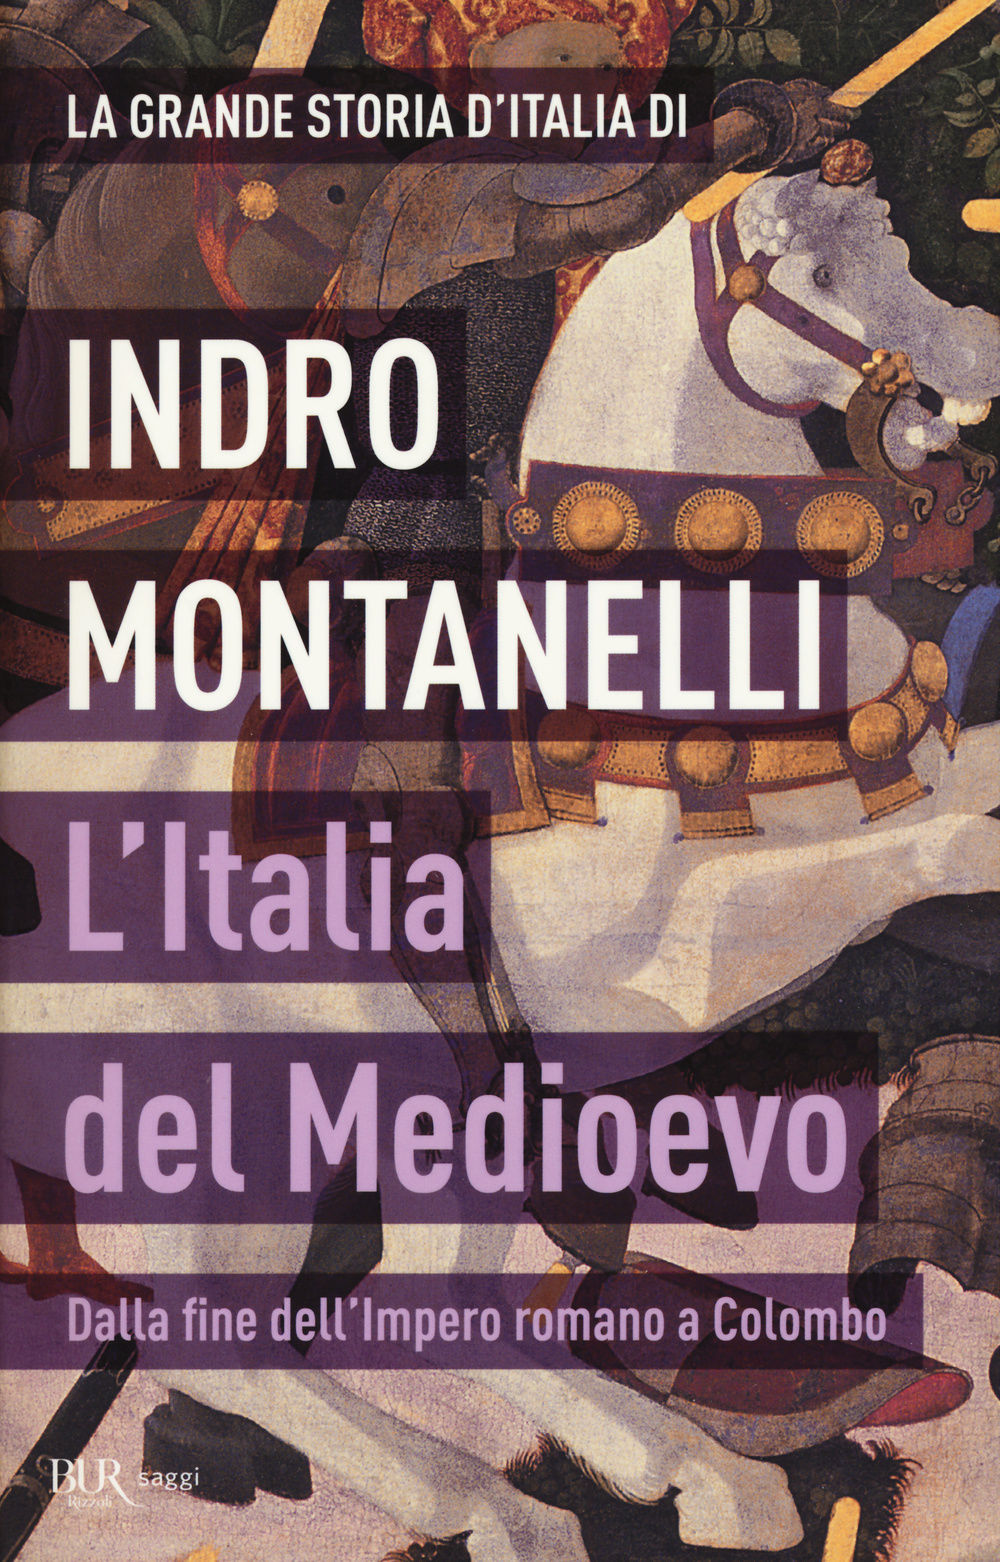 L' Italia del Medioevo